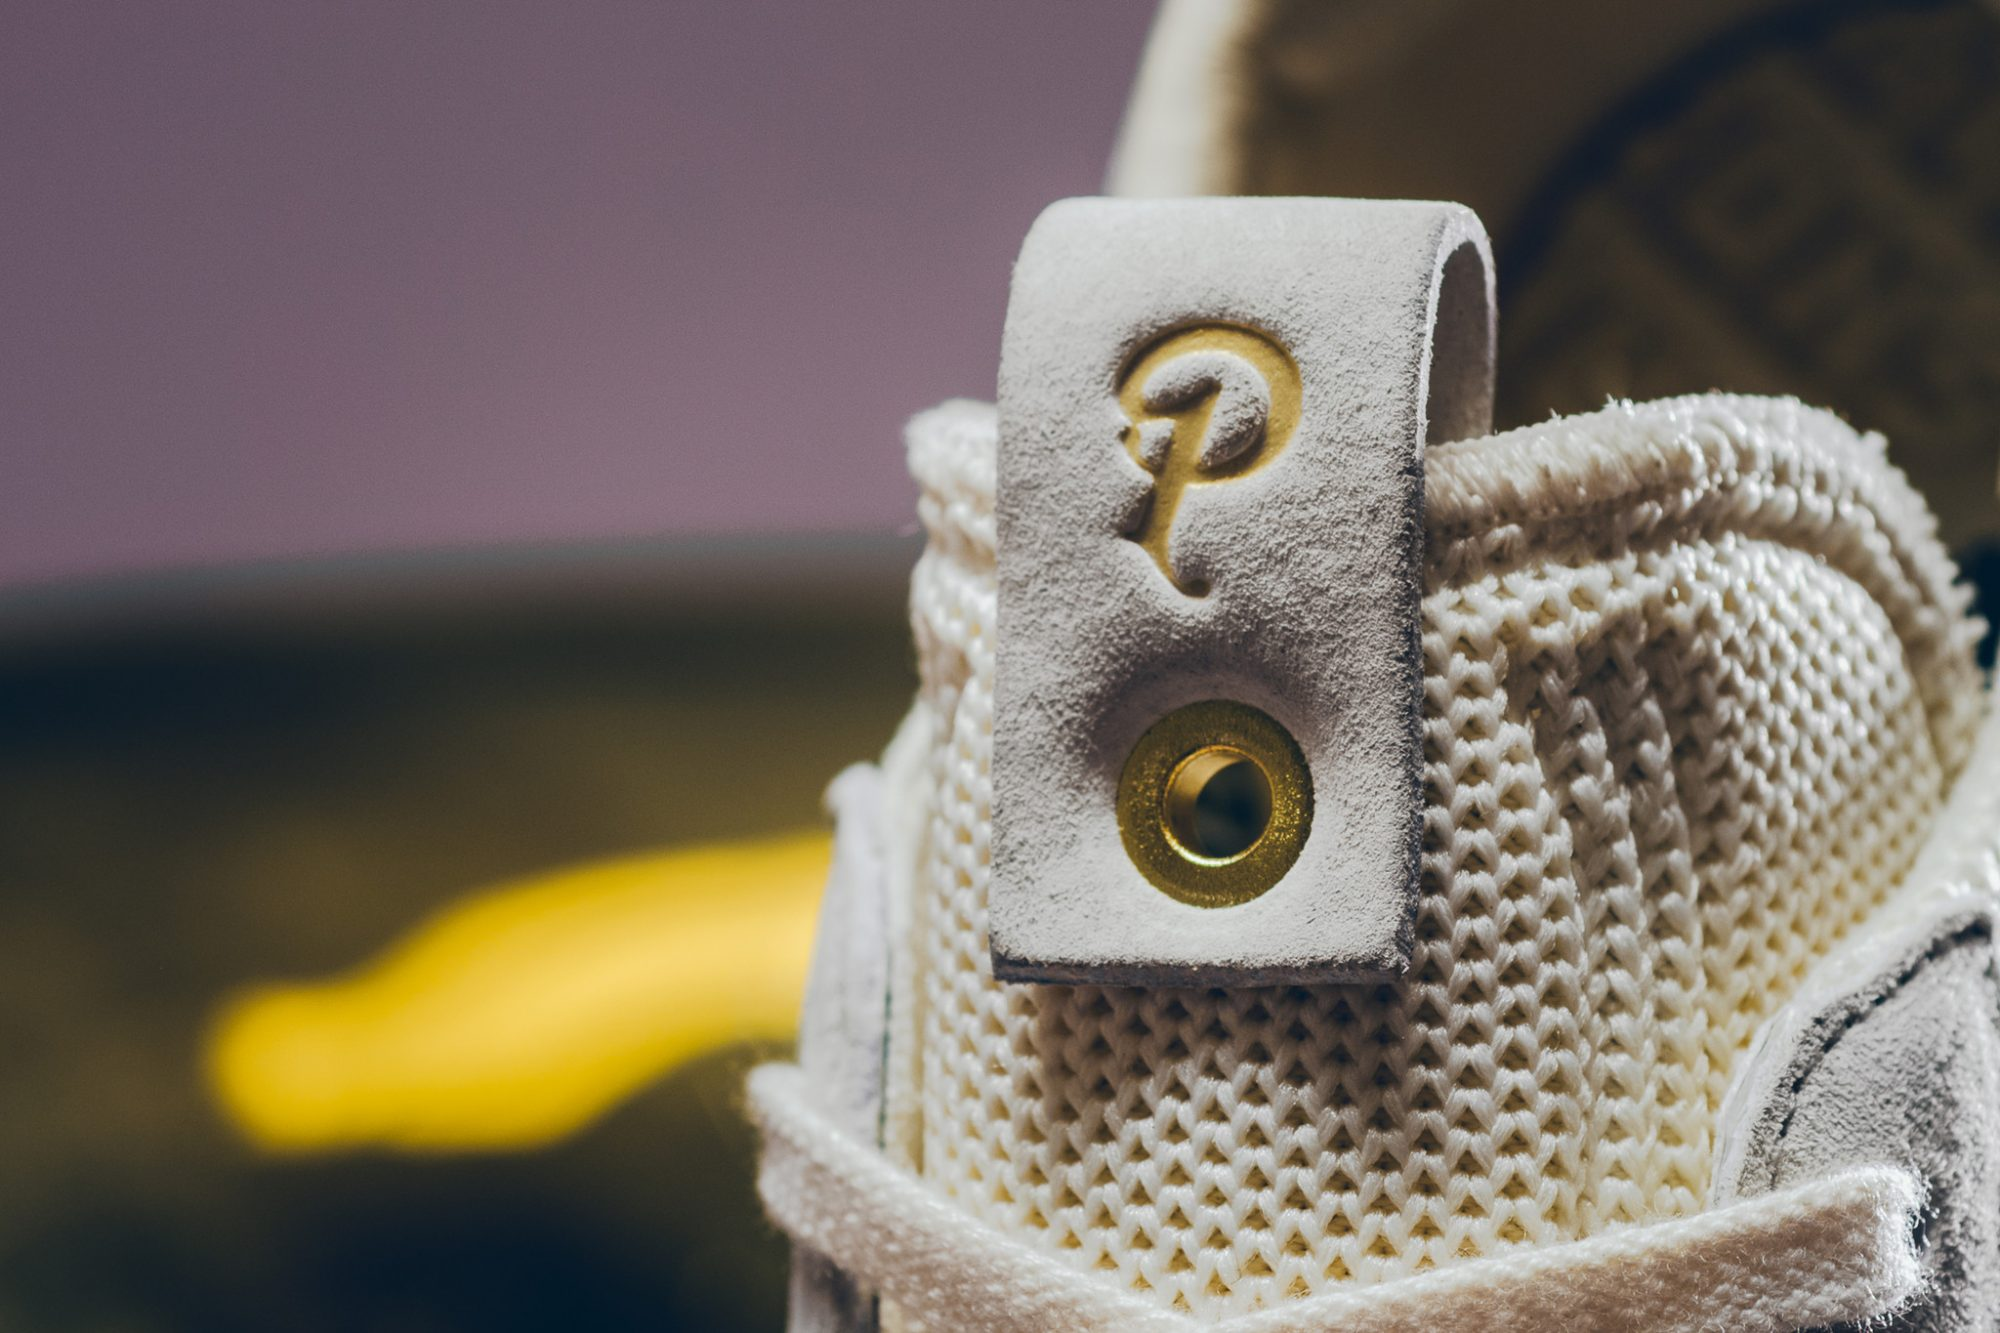 Sneaker_Politics_x_Adidas_Consortium_Gazelle_Primeknit_Mardi_Gras_6